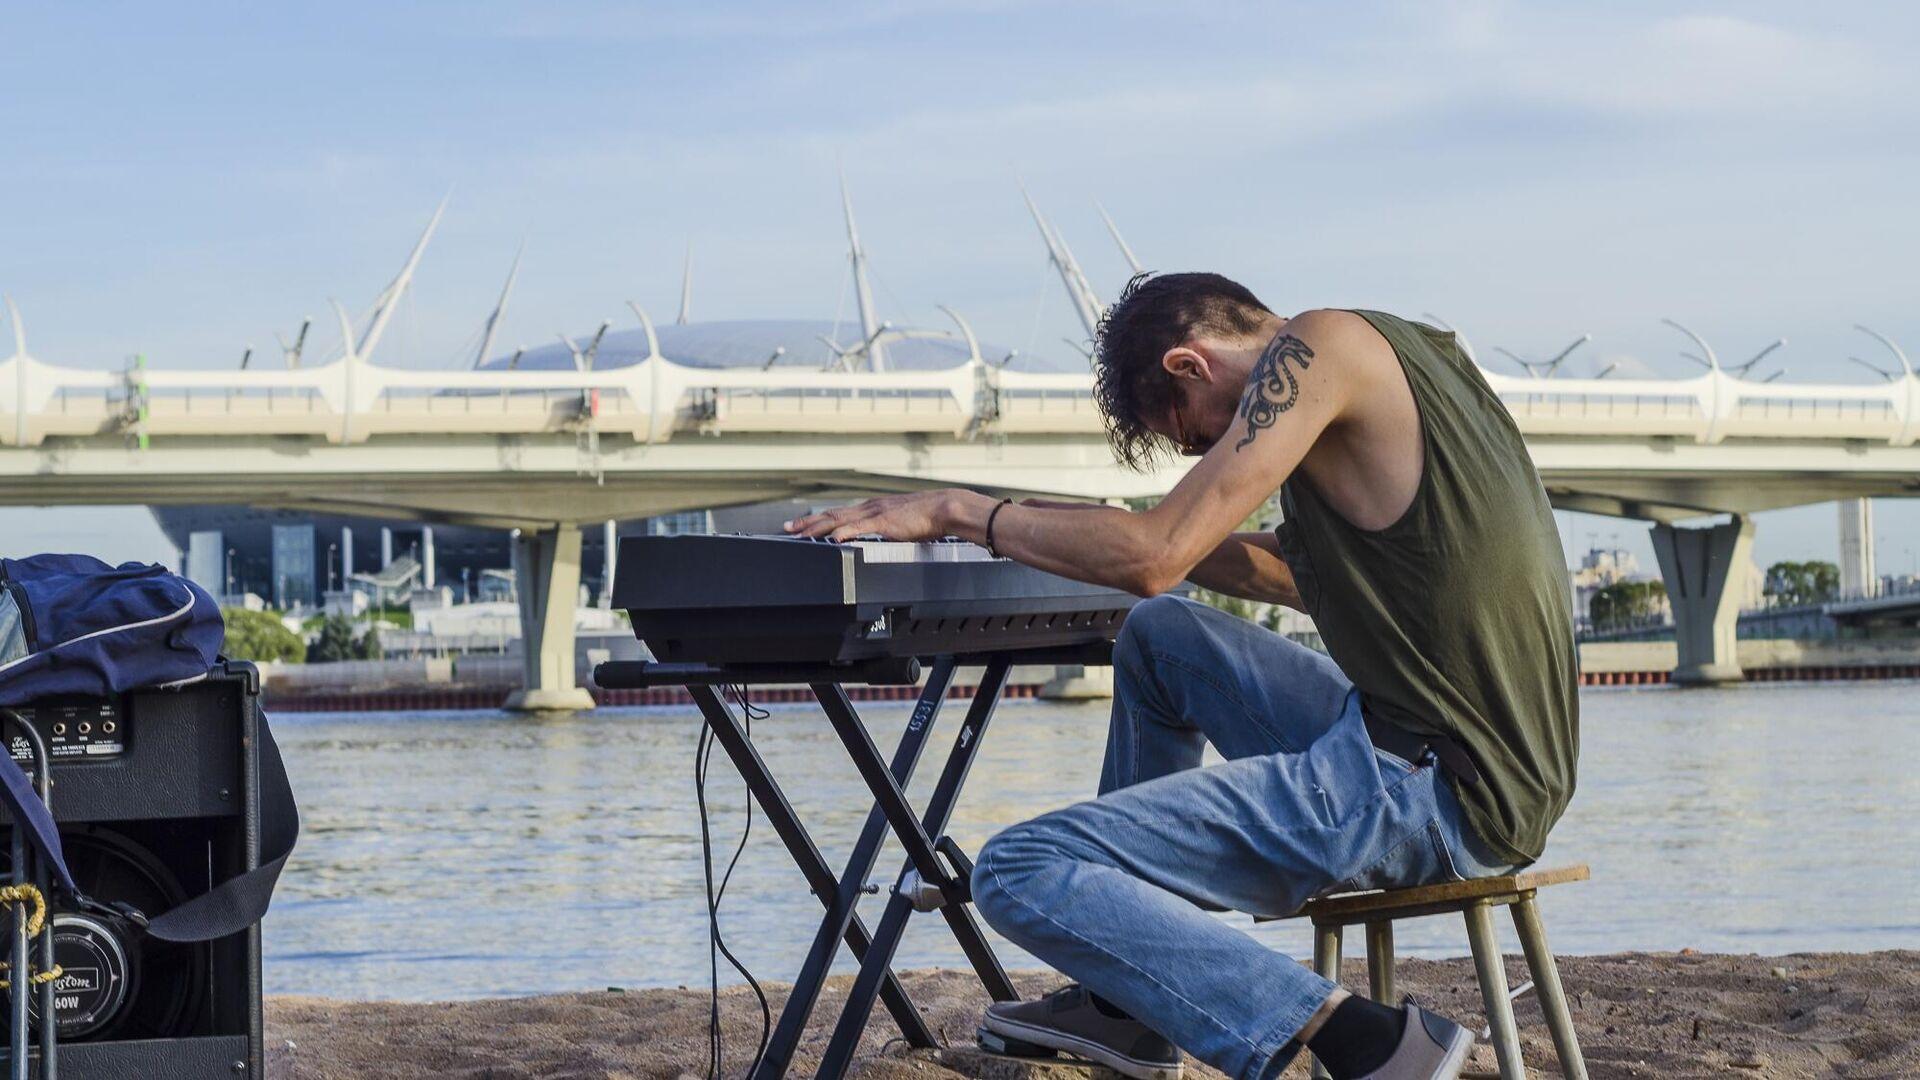 1577840227 0:200:2000:1325 1920x0 80 0 0 d08473801d38564ef9d9400c1232b22e - Пианист из Санкт-Петербурга установил мировой рекорд